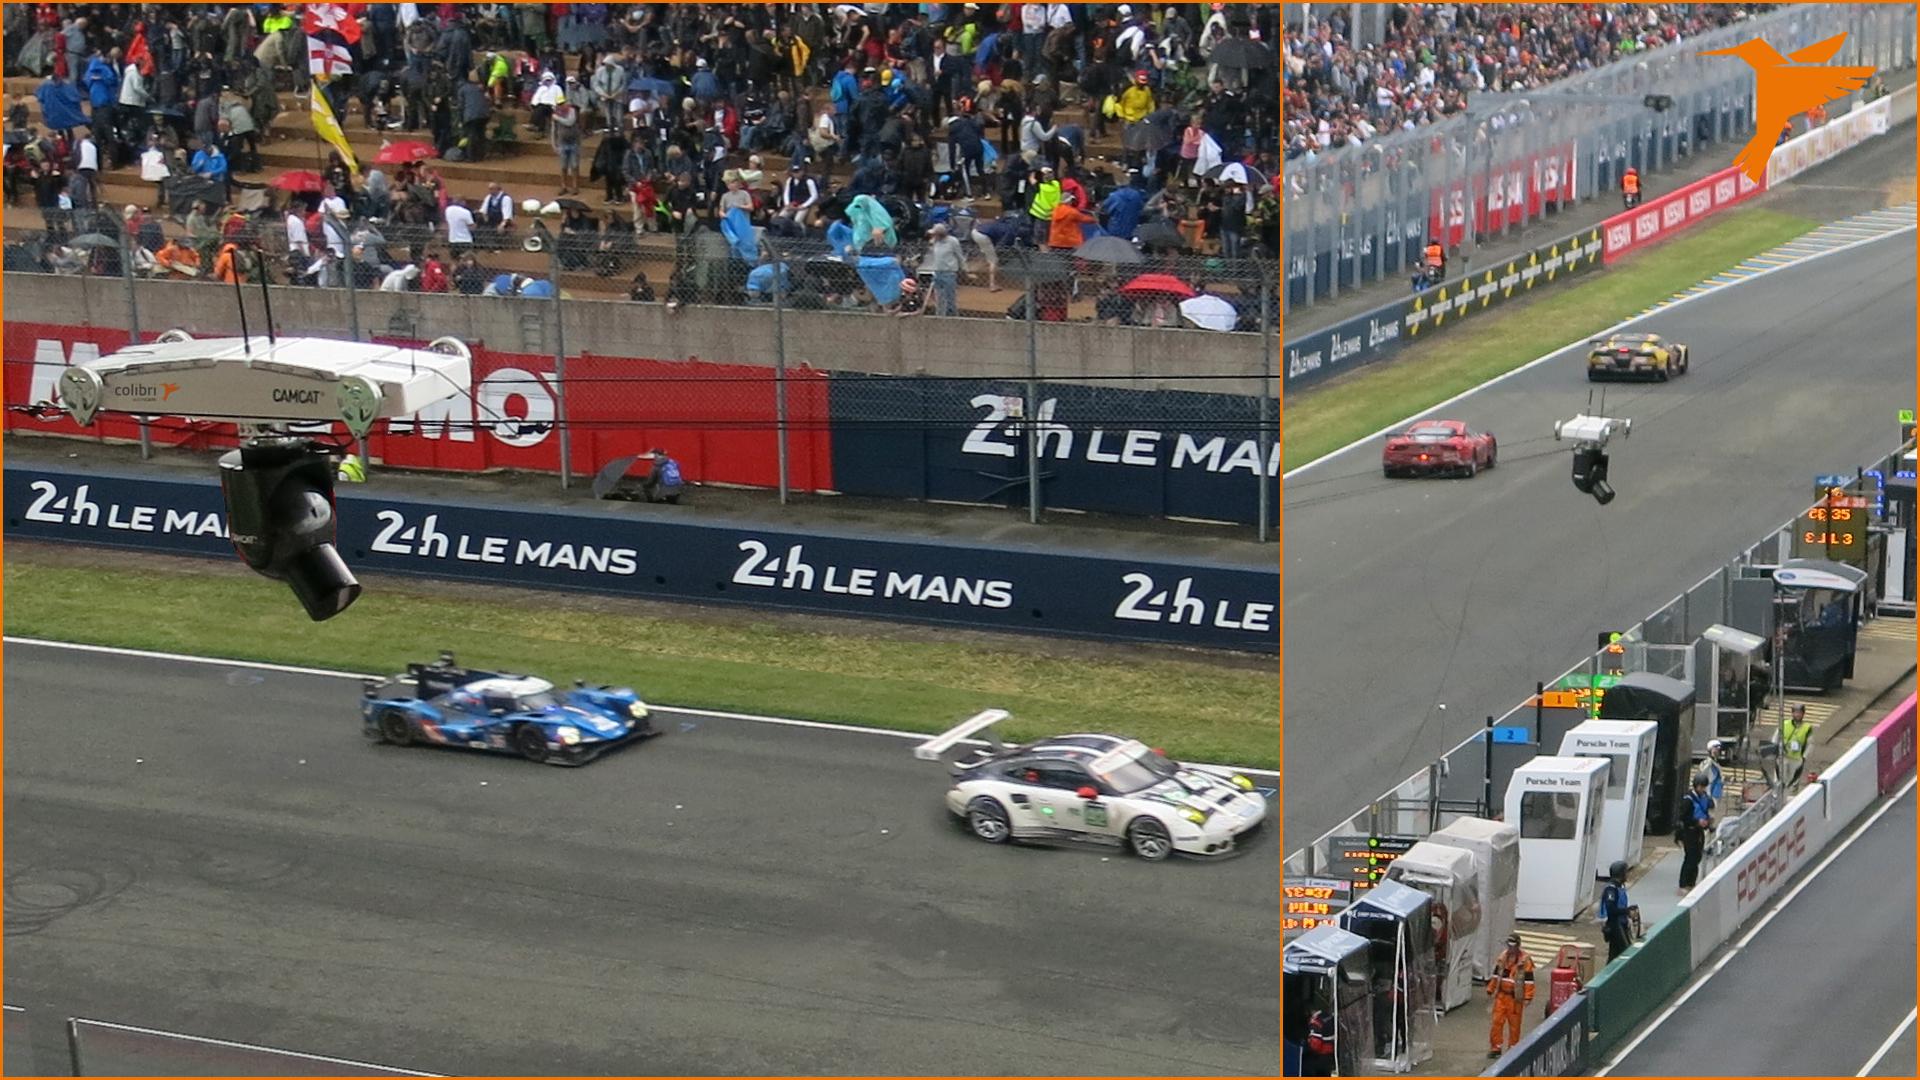 24h Le Mans, Colibri WireCam, cablecam, wirecam